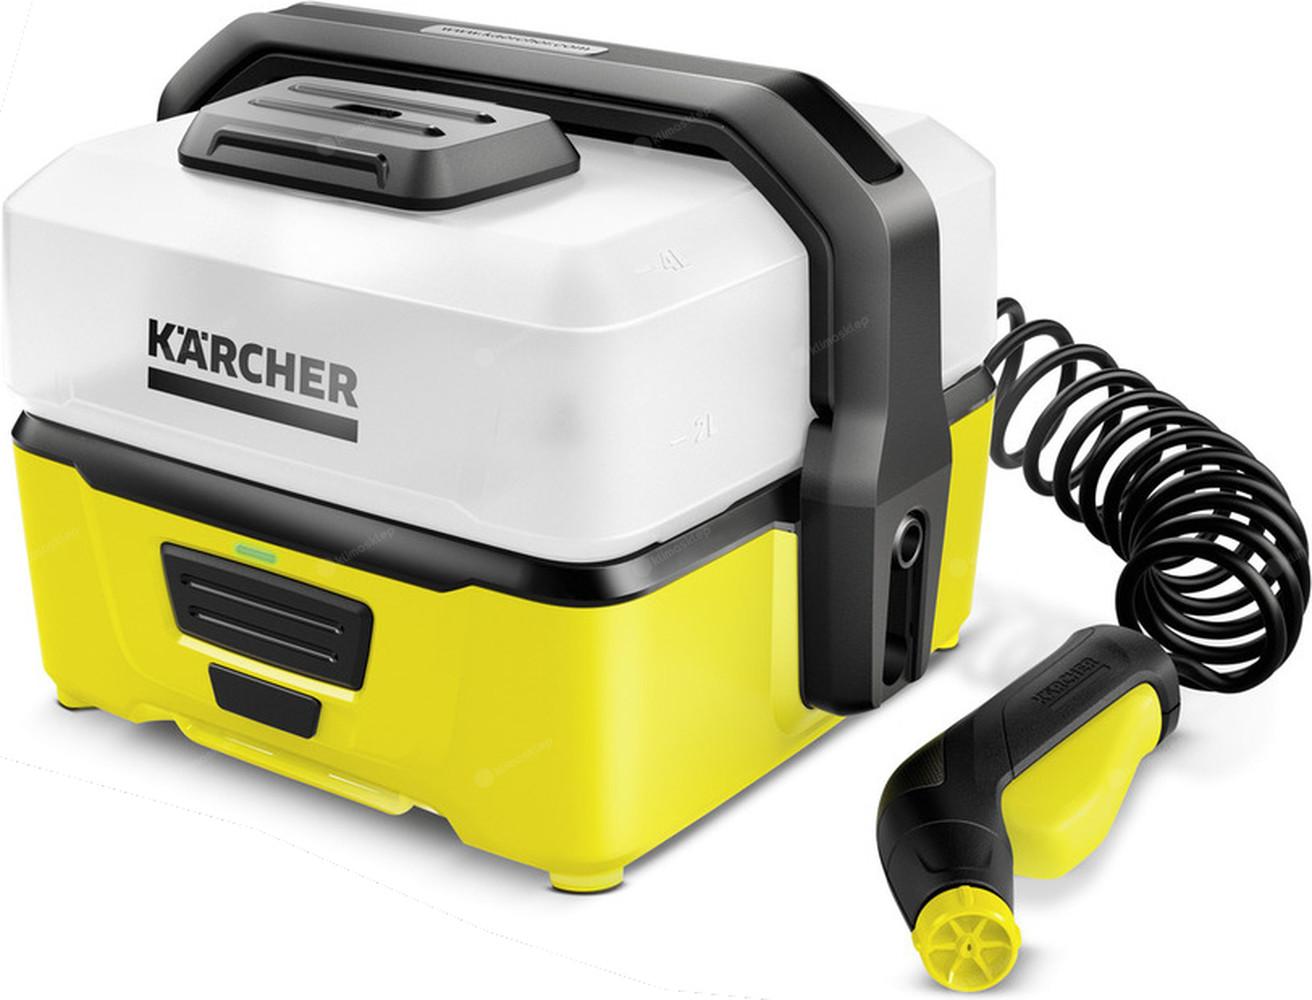 Akumulatorowa myjka ciśnieniowa Kärcher OC 3 Mobile Outdoor Cleaner z zestawem Adventure Box